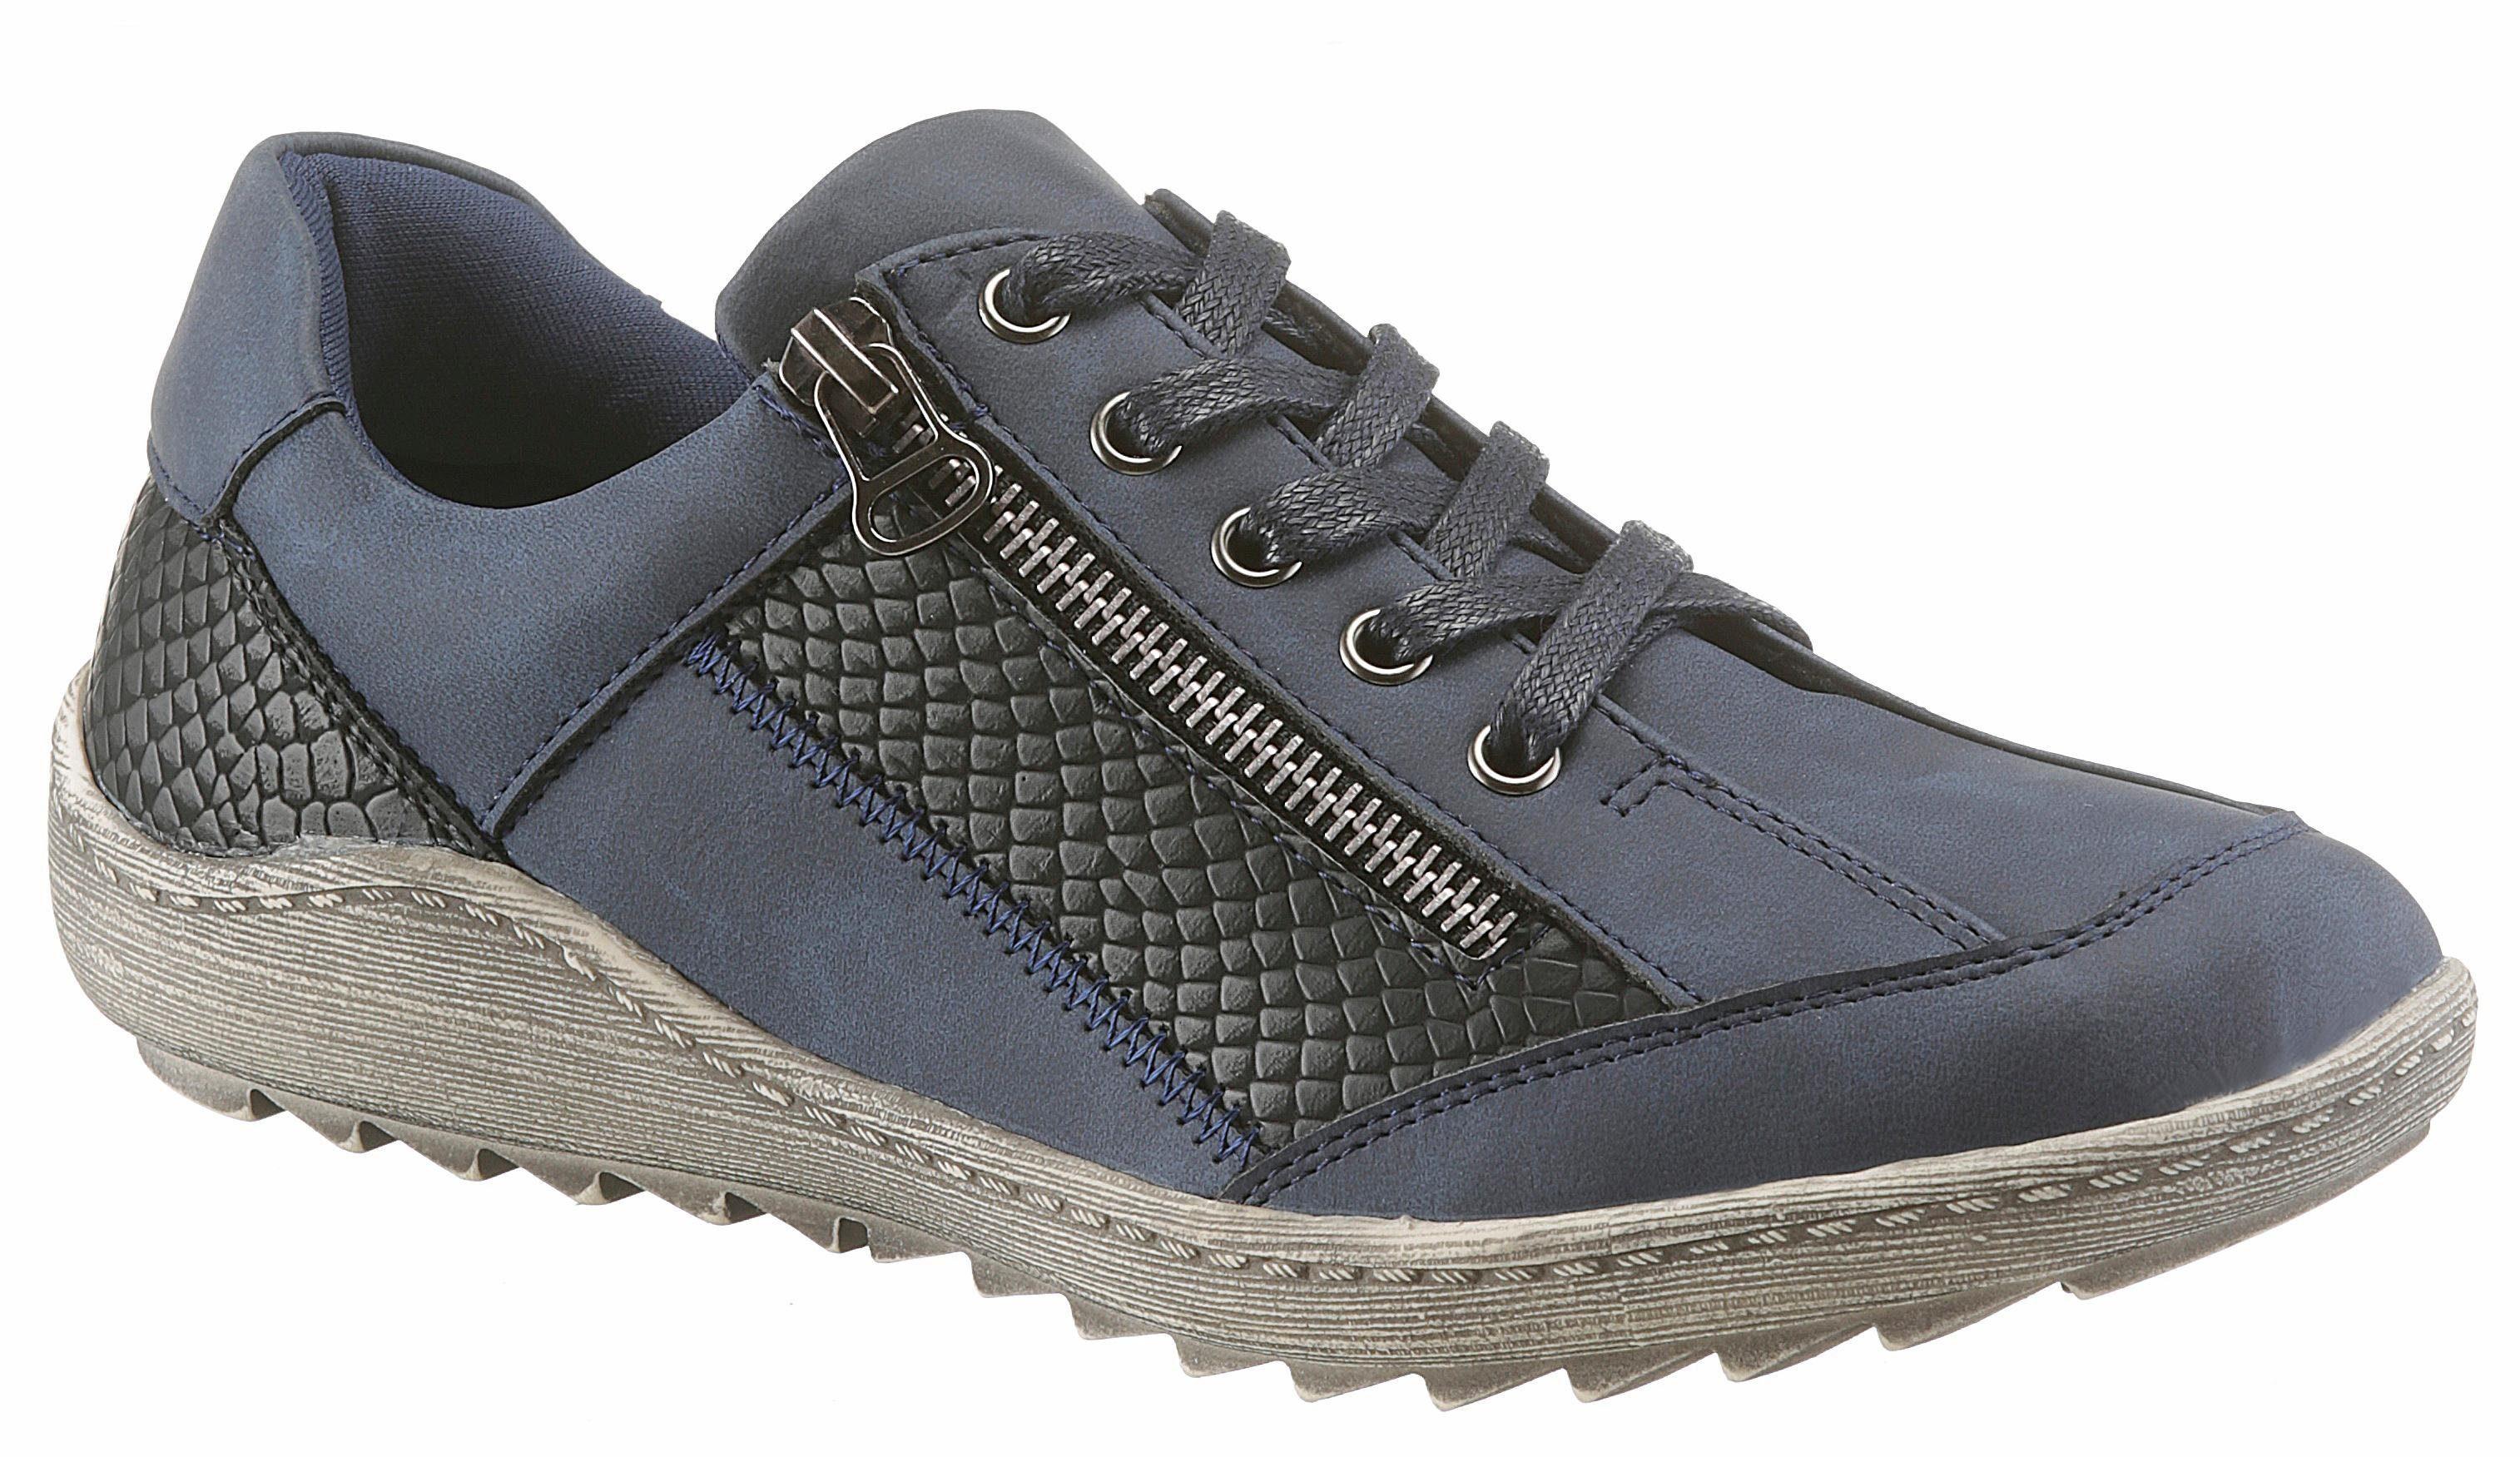 CITY WALK Sneaker, mit Reptilienprägung kaufen  grau-blau